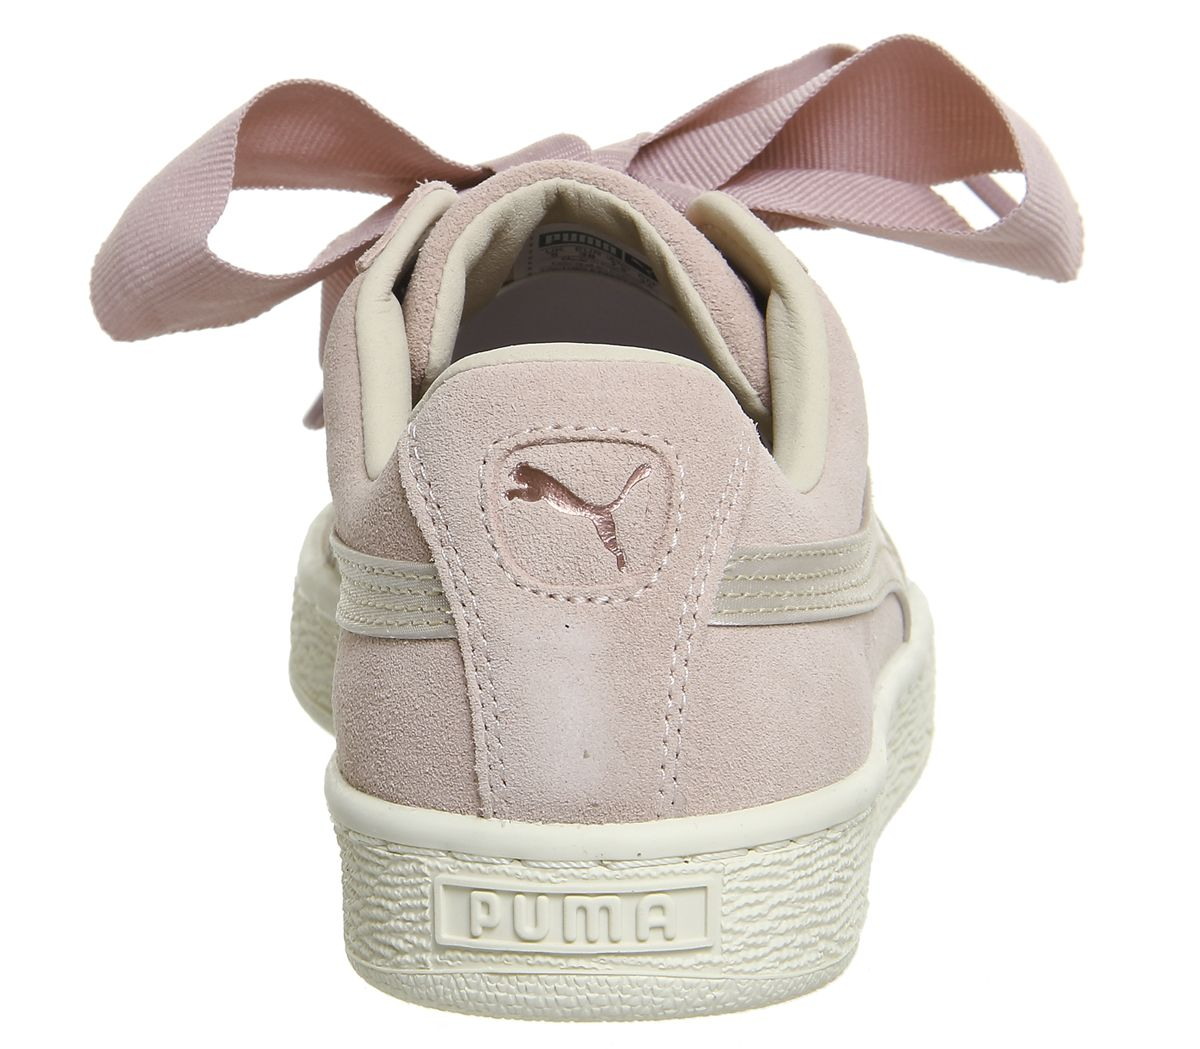 5614c2fc7e6 Puma Suede Heart Trainers Silver Pink Tint Rose Gold - Hers trainers puma  suede heart trainers